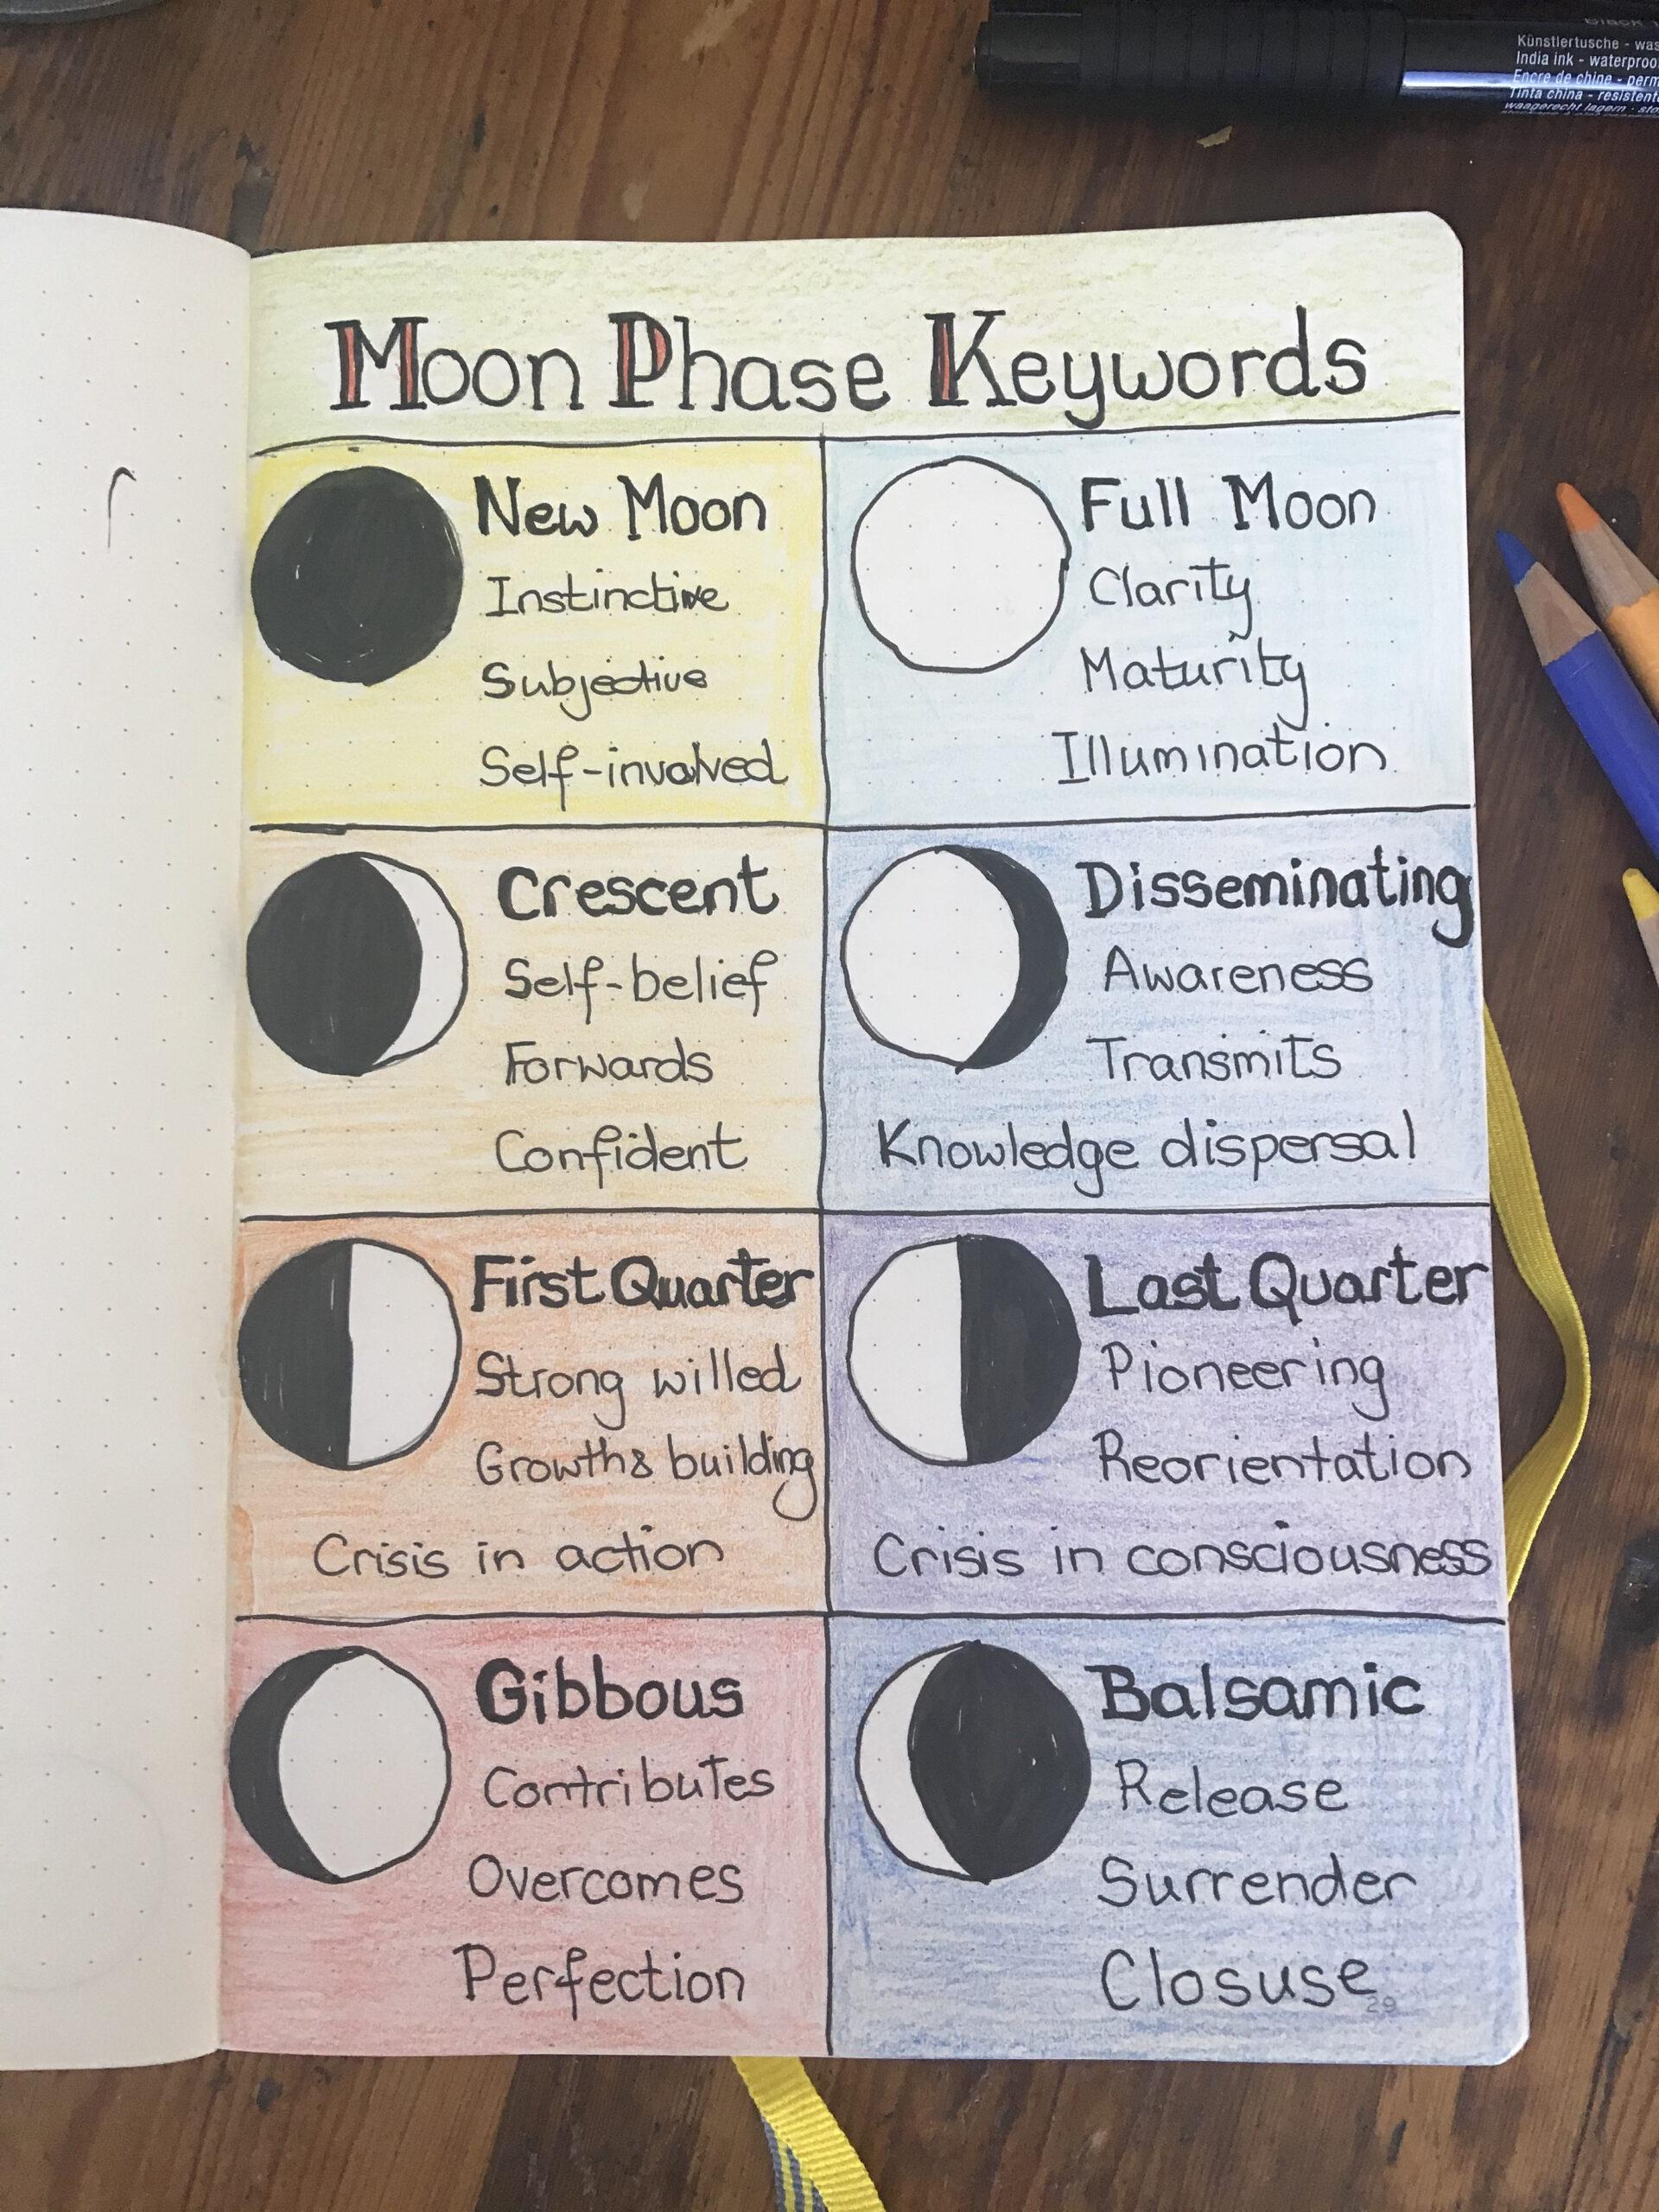 Moon Phase Keywords for each lunar phase.